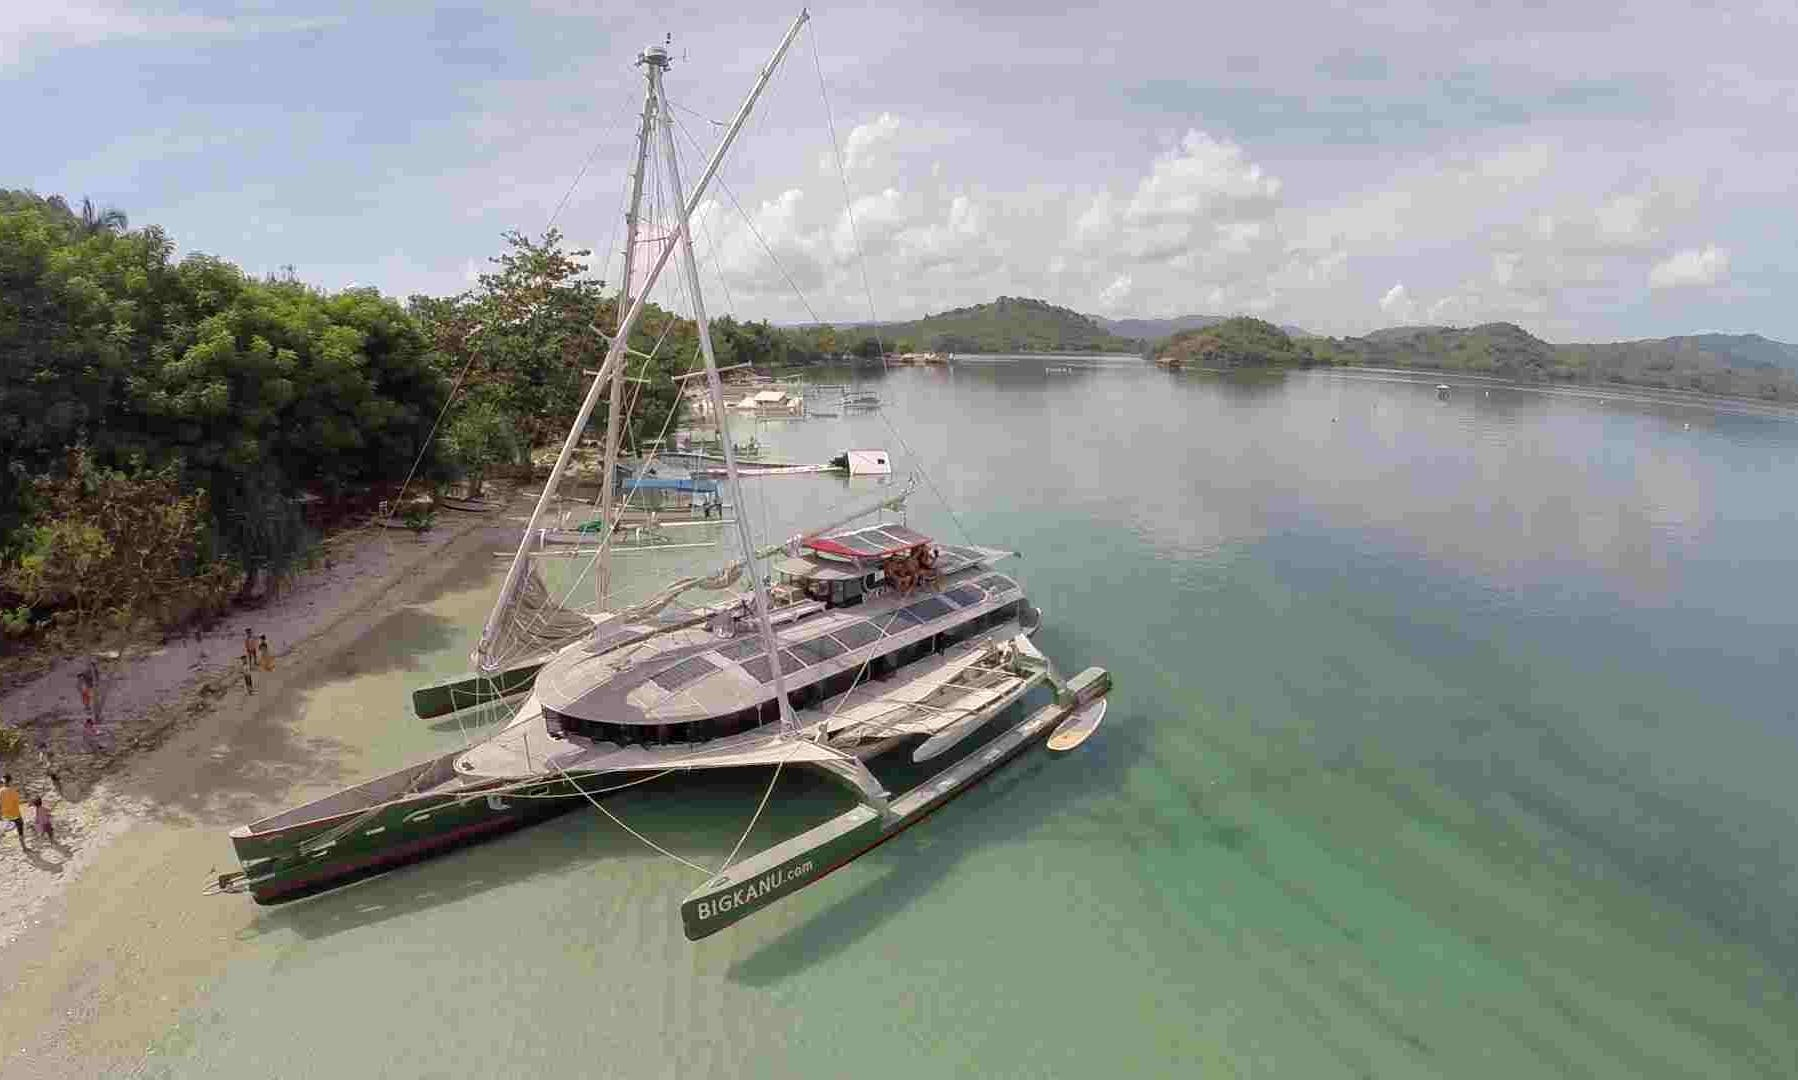 Cruising Catamaran rental in Bali, Gilis and Lombok